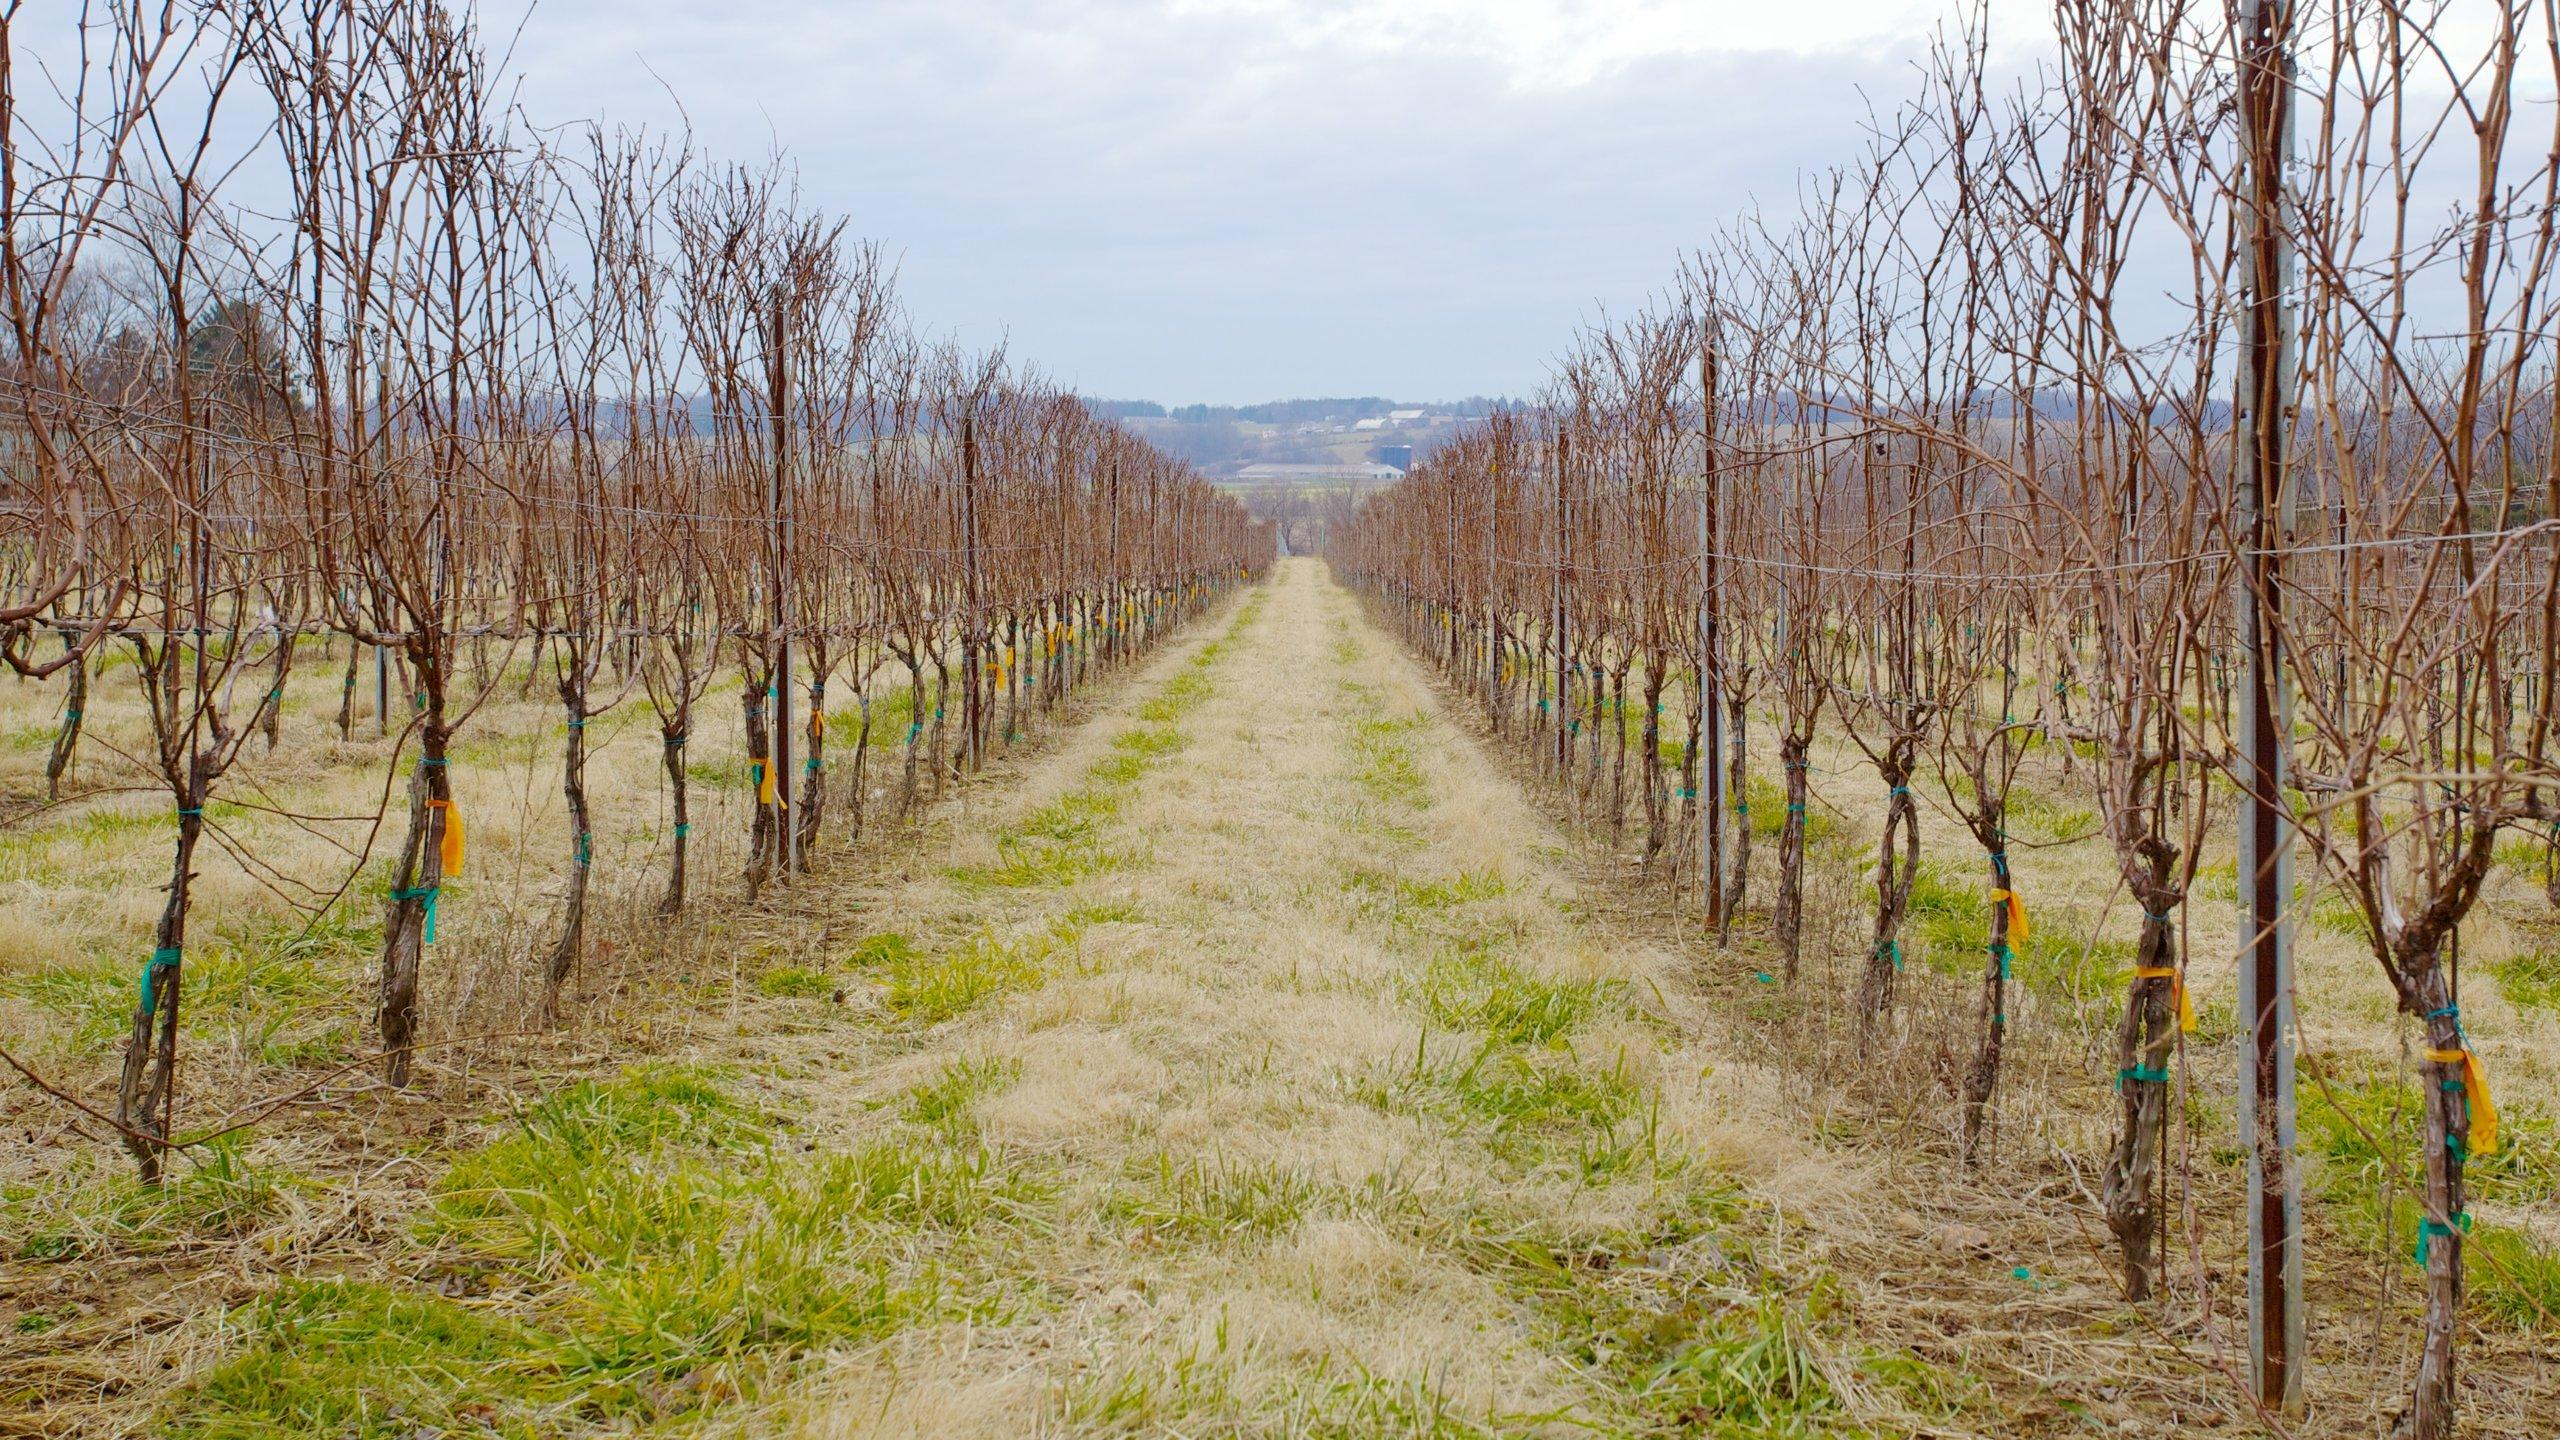 Boordy Vineyards, Hydes, Maryland, Verenigde Staten